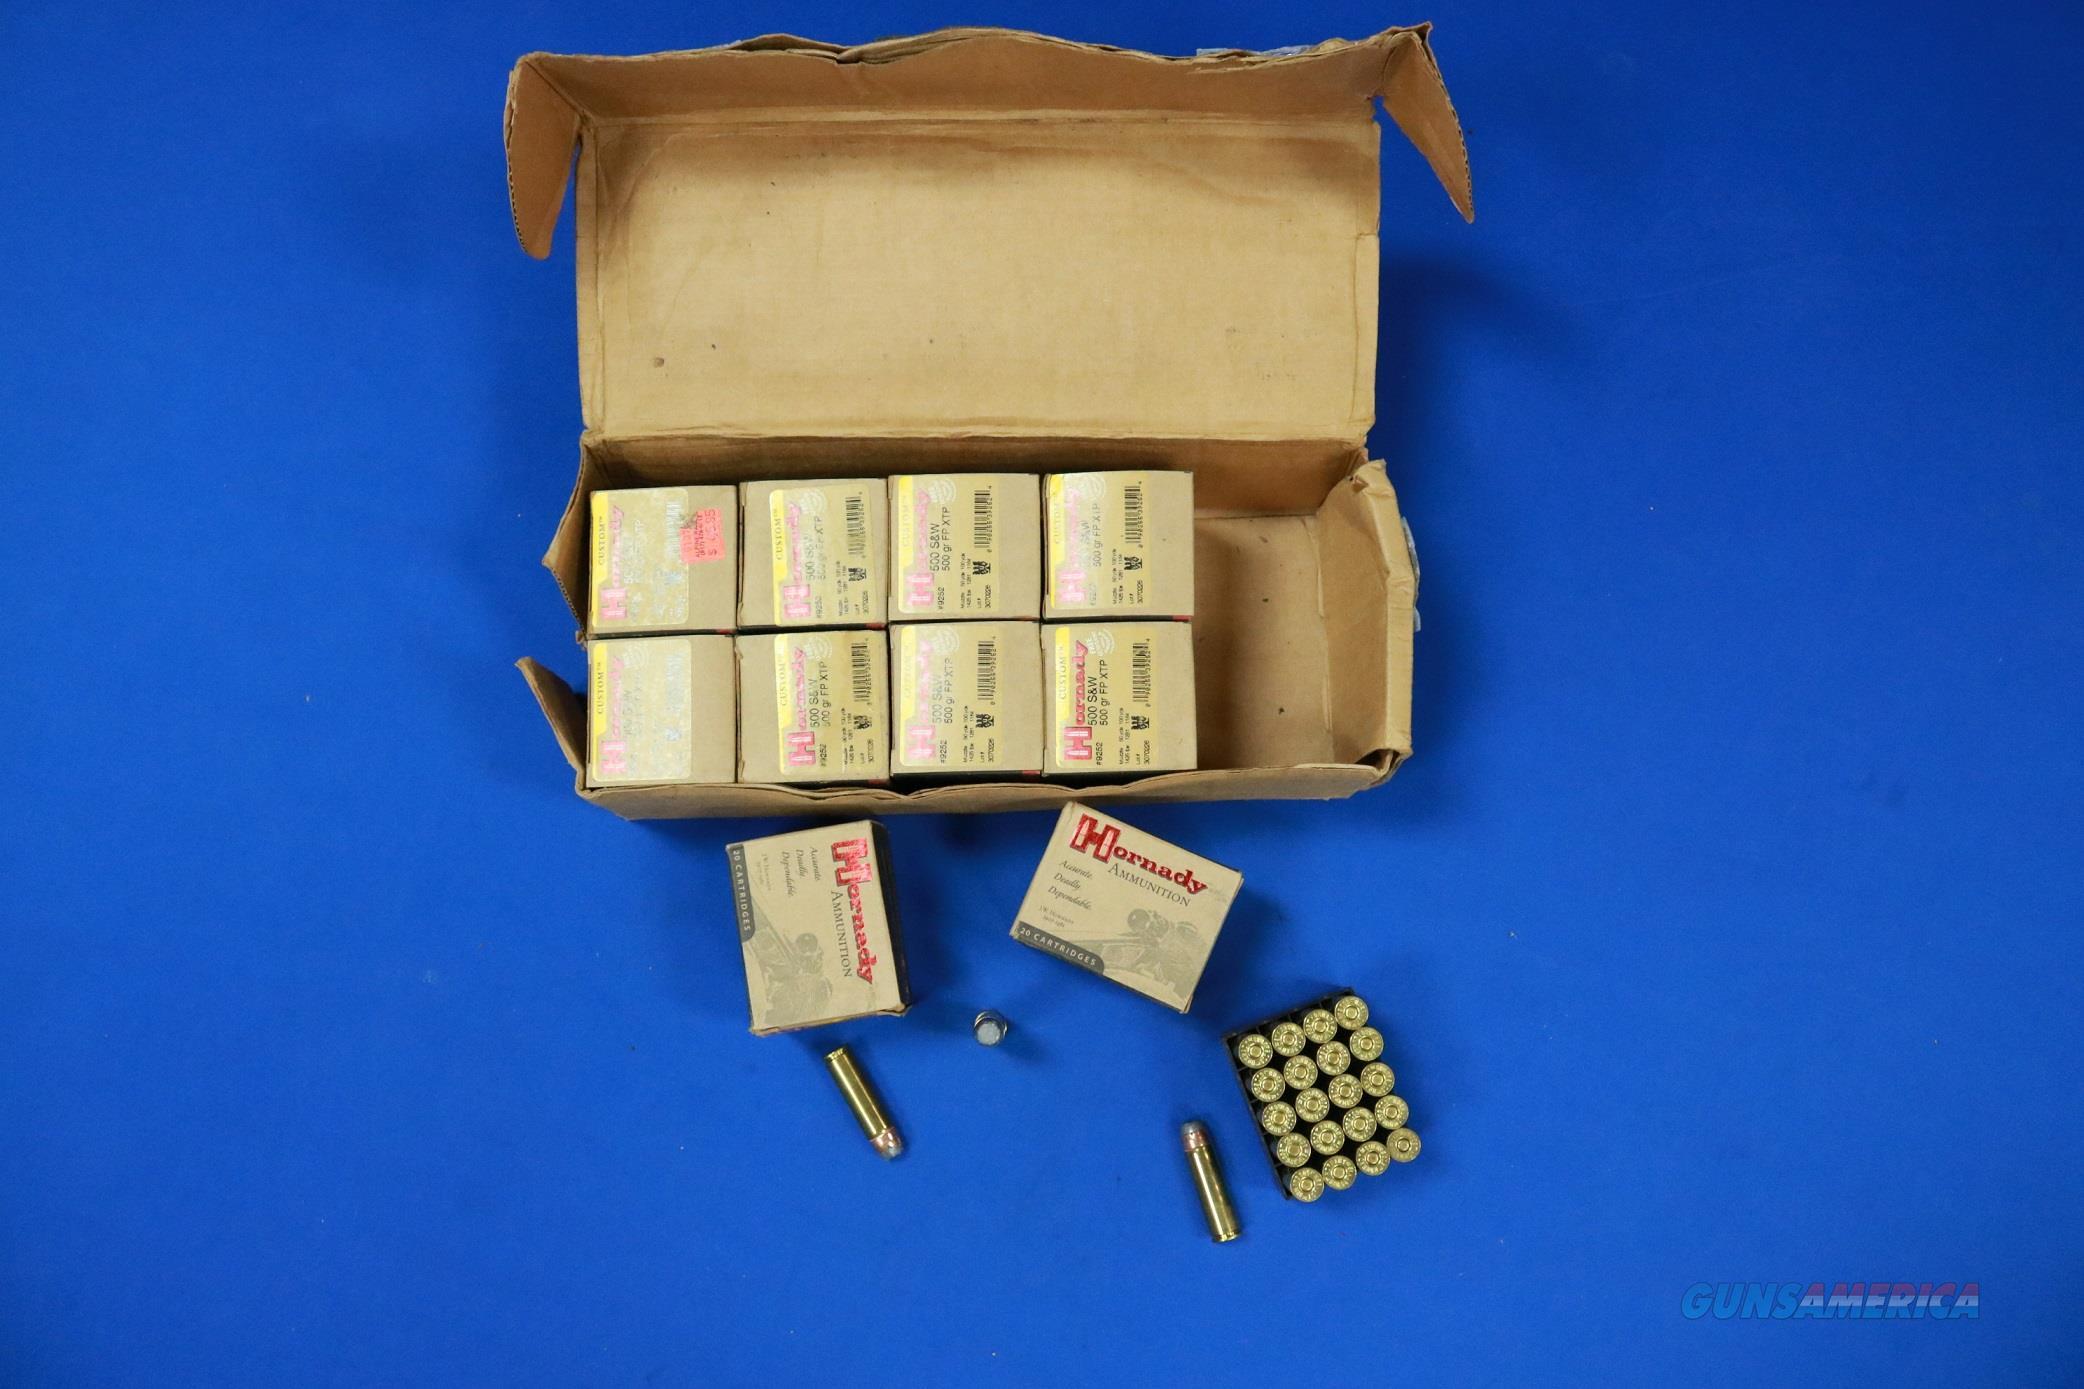 HORNADY .500 S&W .500 gr FP XTP MAG 200 ROUND CASE  Non-Guns > Ammunition